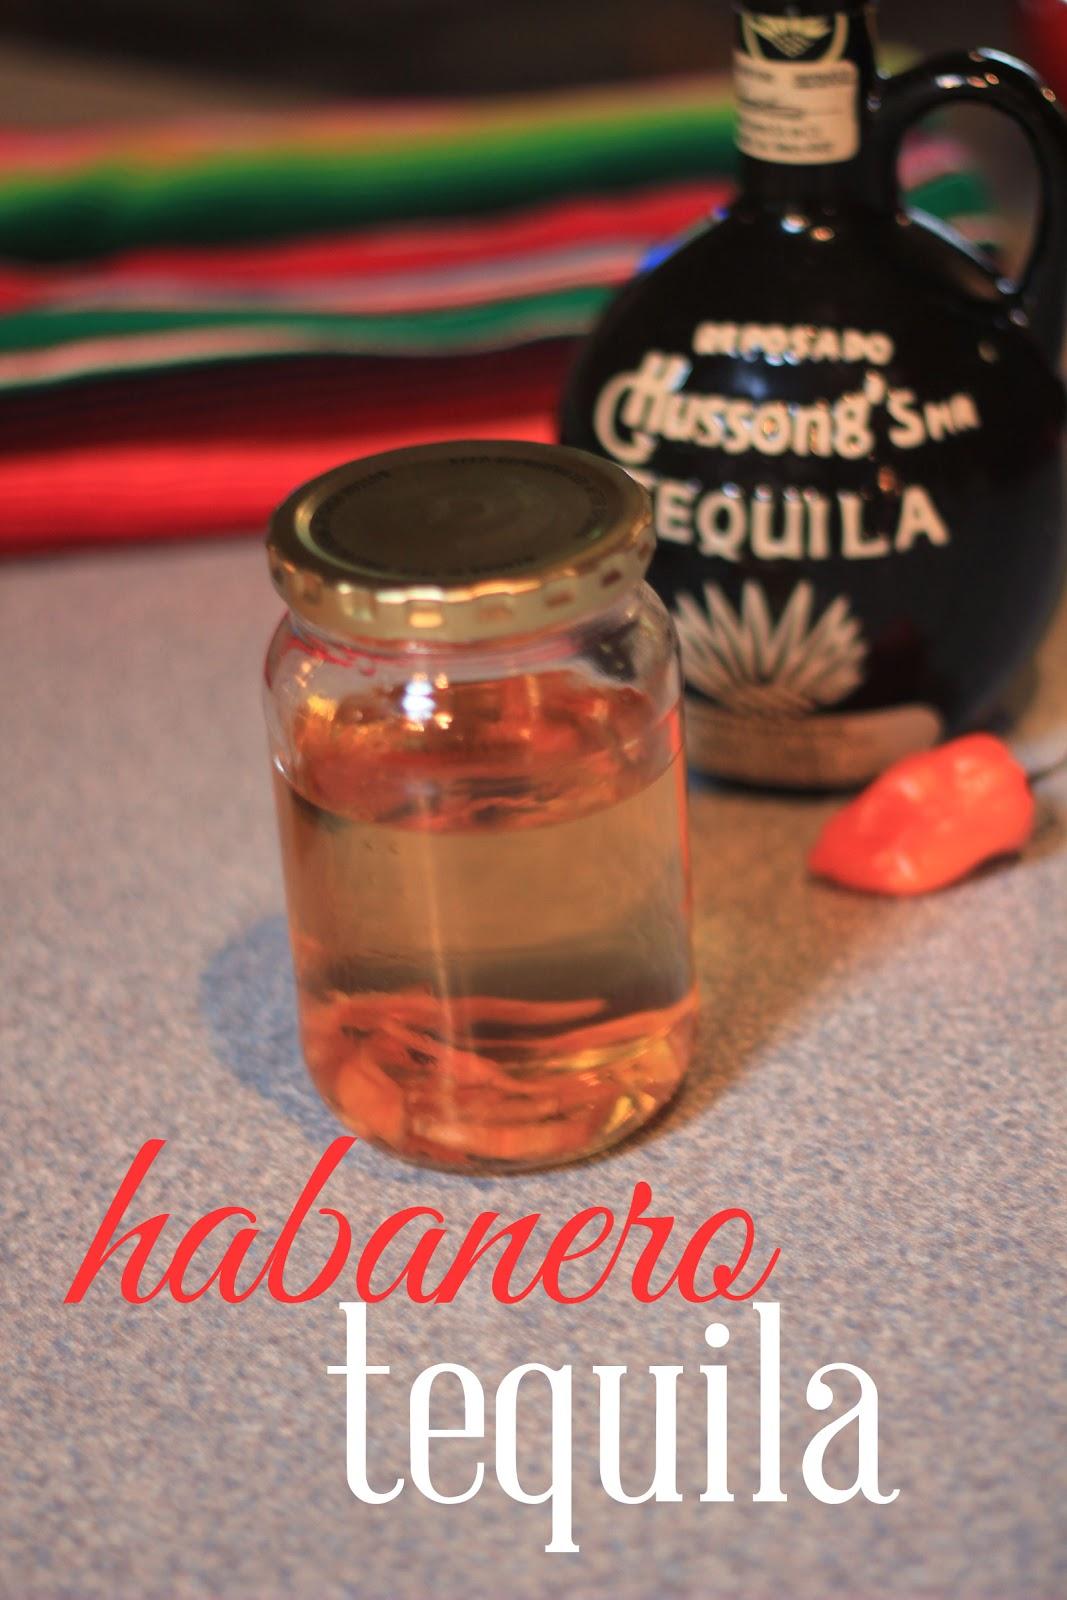 HABANERO TEQUILA - ONE armed MAMA